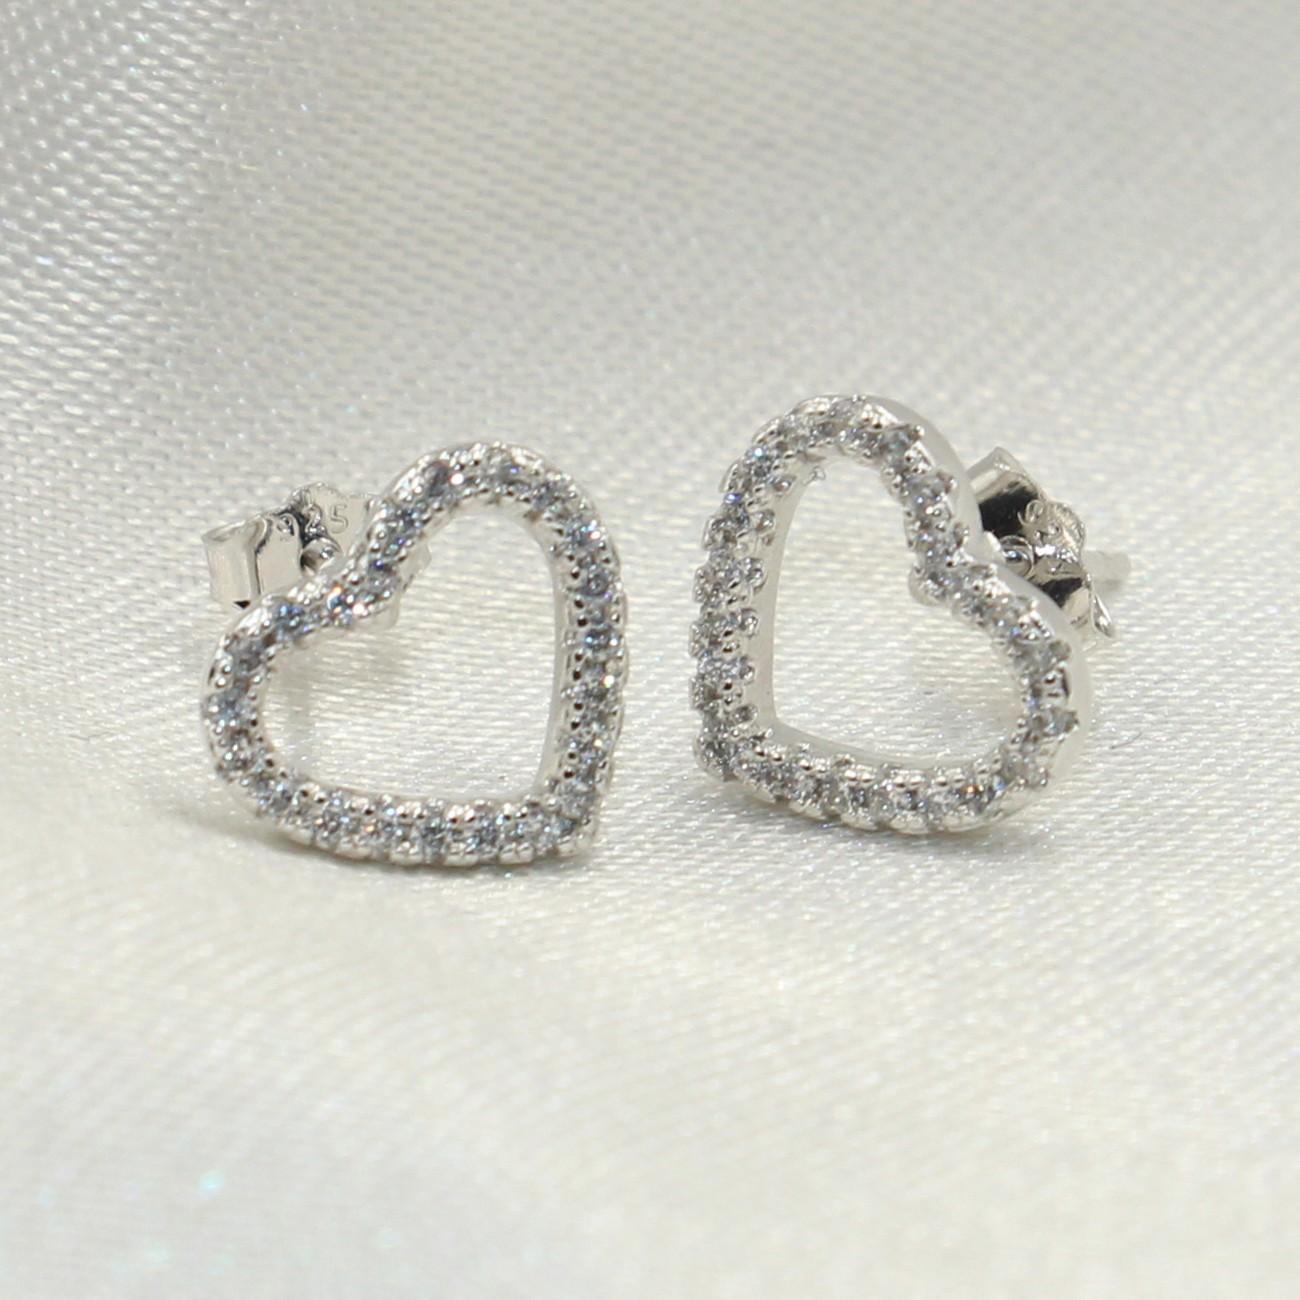 8263f00df 2019 Cute Girls Earring Brand New Luxury Jewelry 925 Sterling Silver Stud  Earring Pave Hollow 5A Cubic Zirconia CZ Diamond Hear Earrings Gift From ...